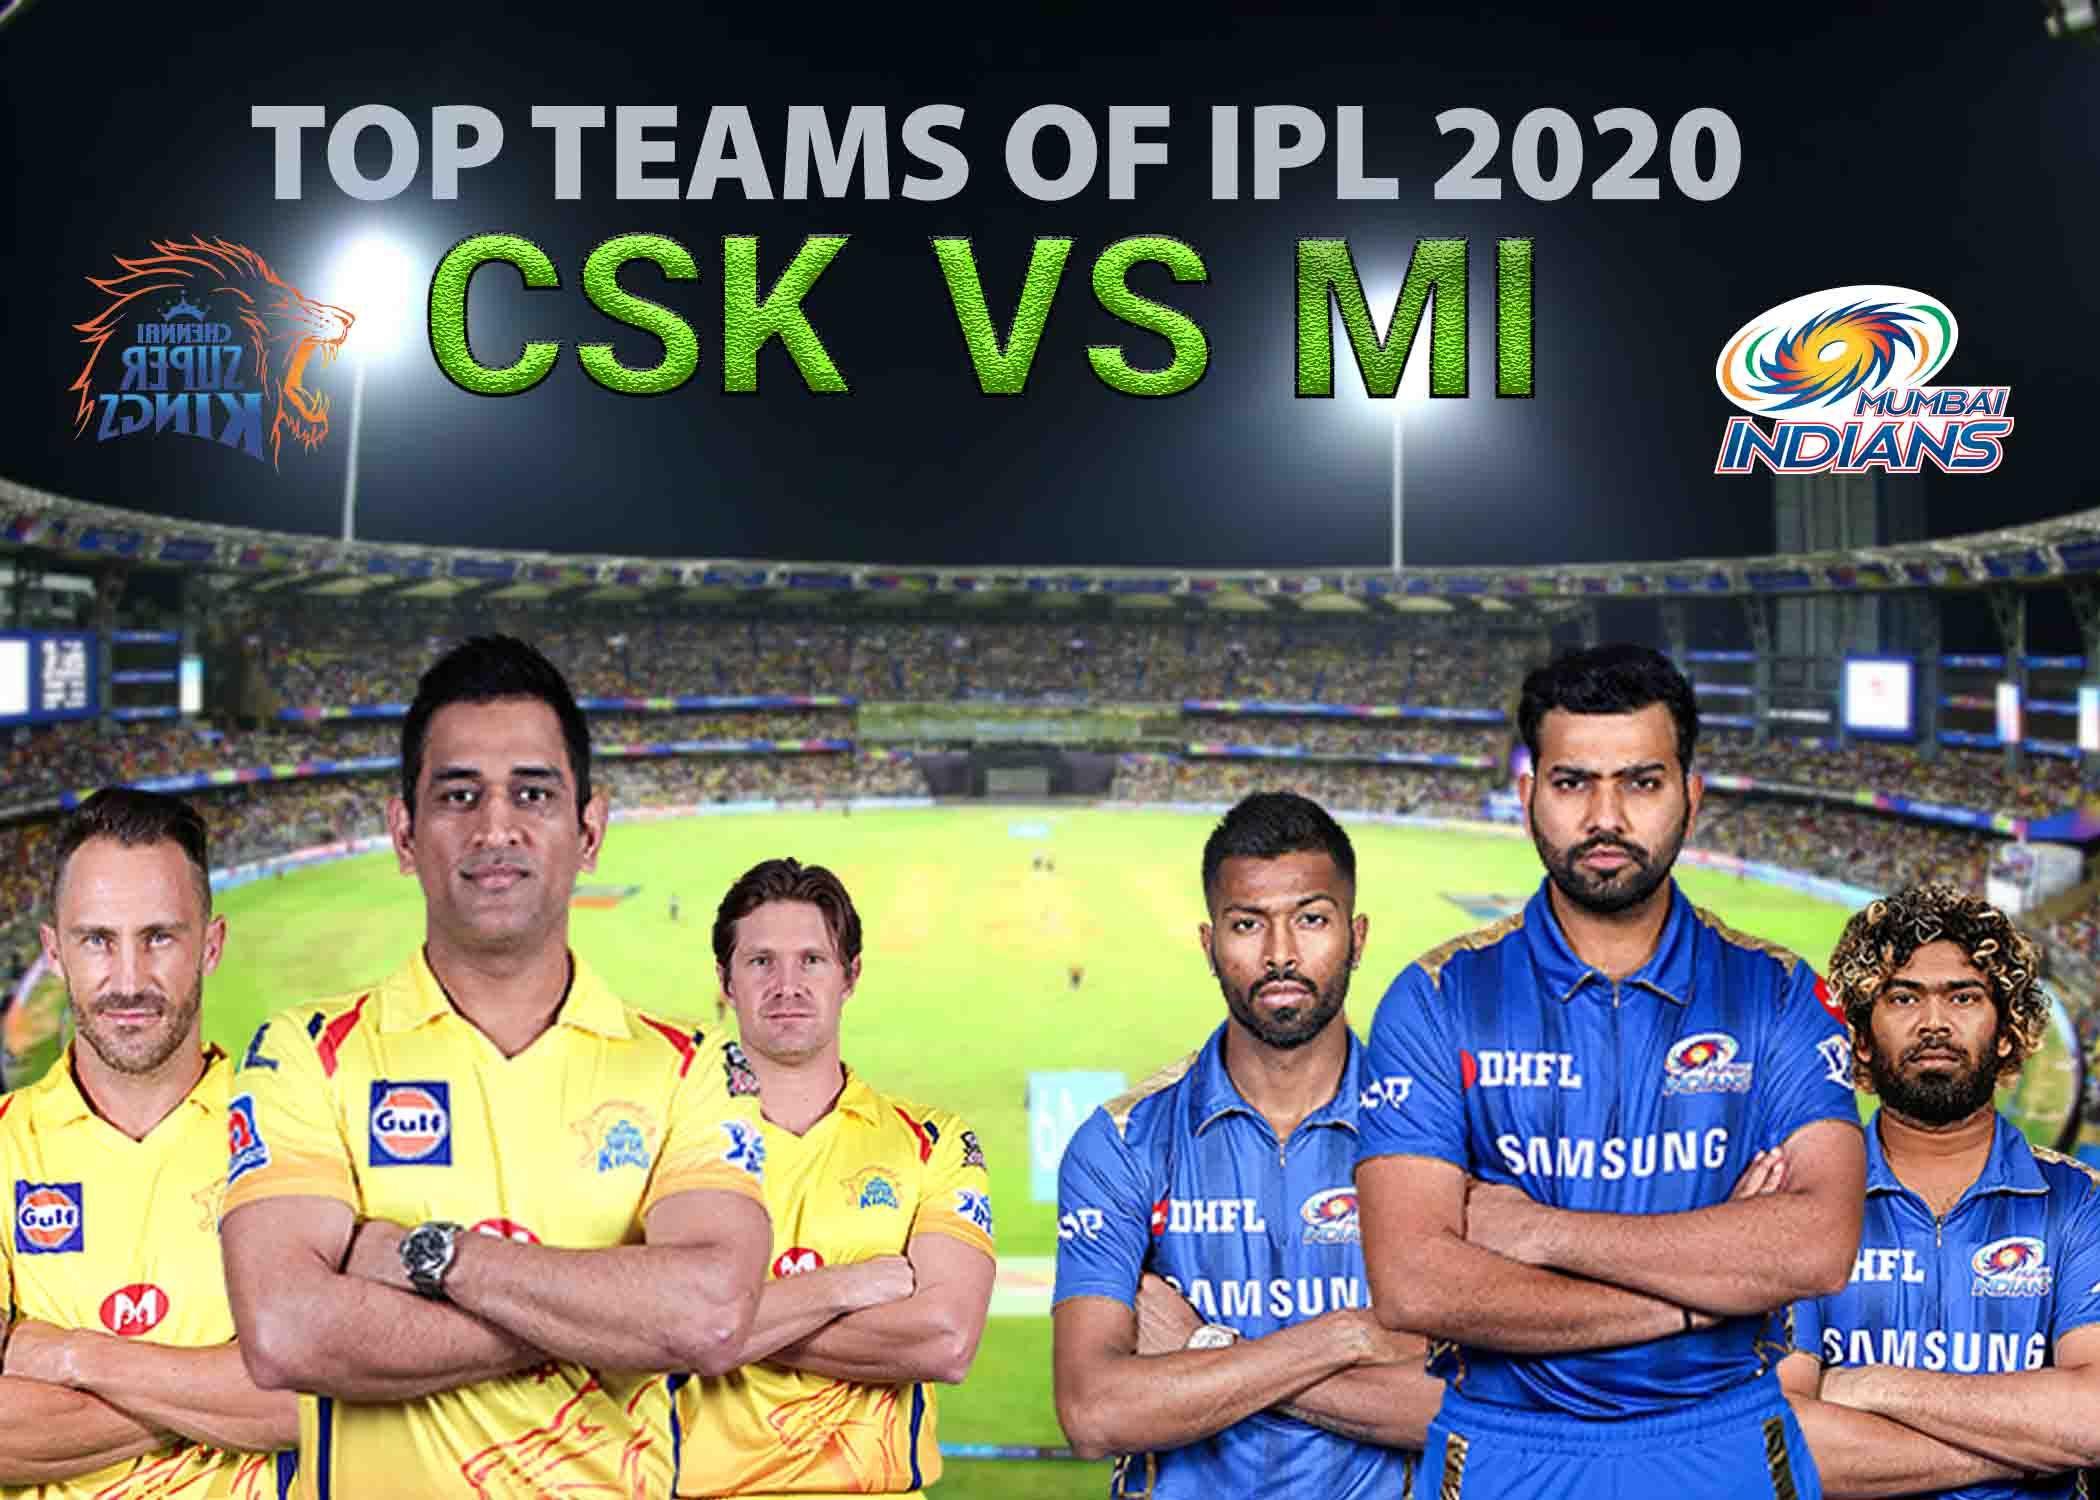 Ipl 2020 Exclusive Csk Vs Mi Team Comparison In Depth Ipl Chennai Super Kings Kolkata Knight Riders